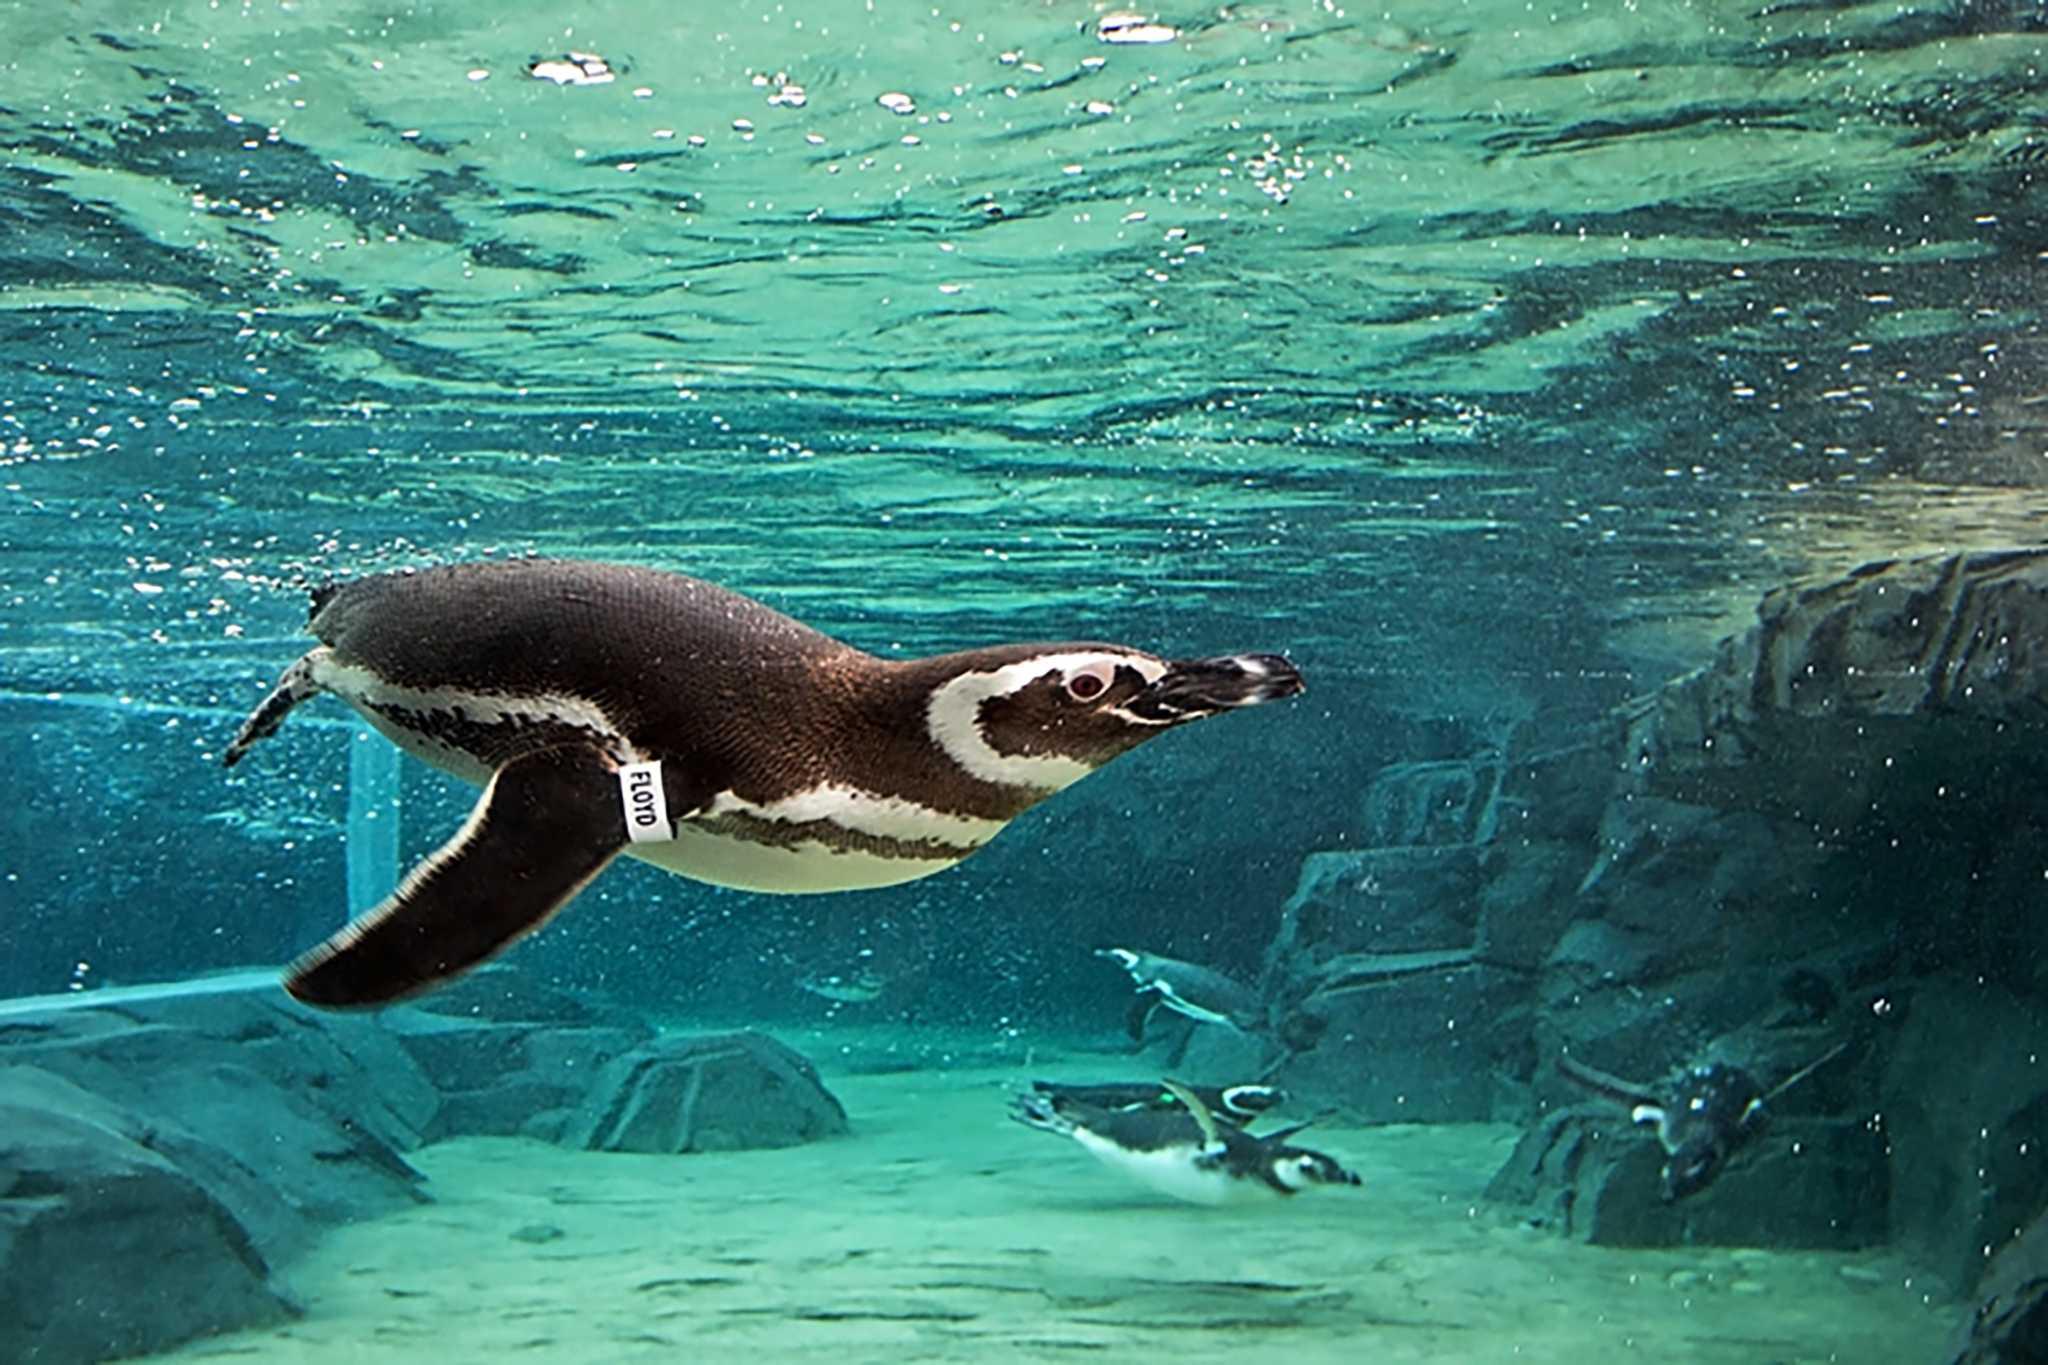 Online aquarium site offers virtual field trips